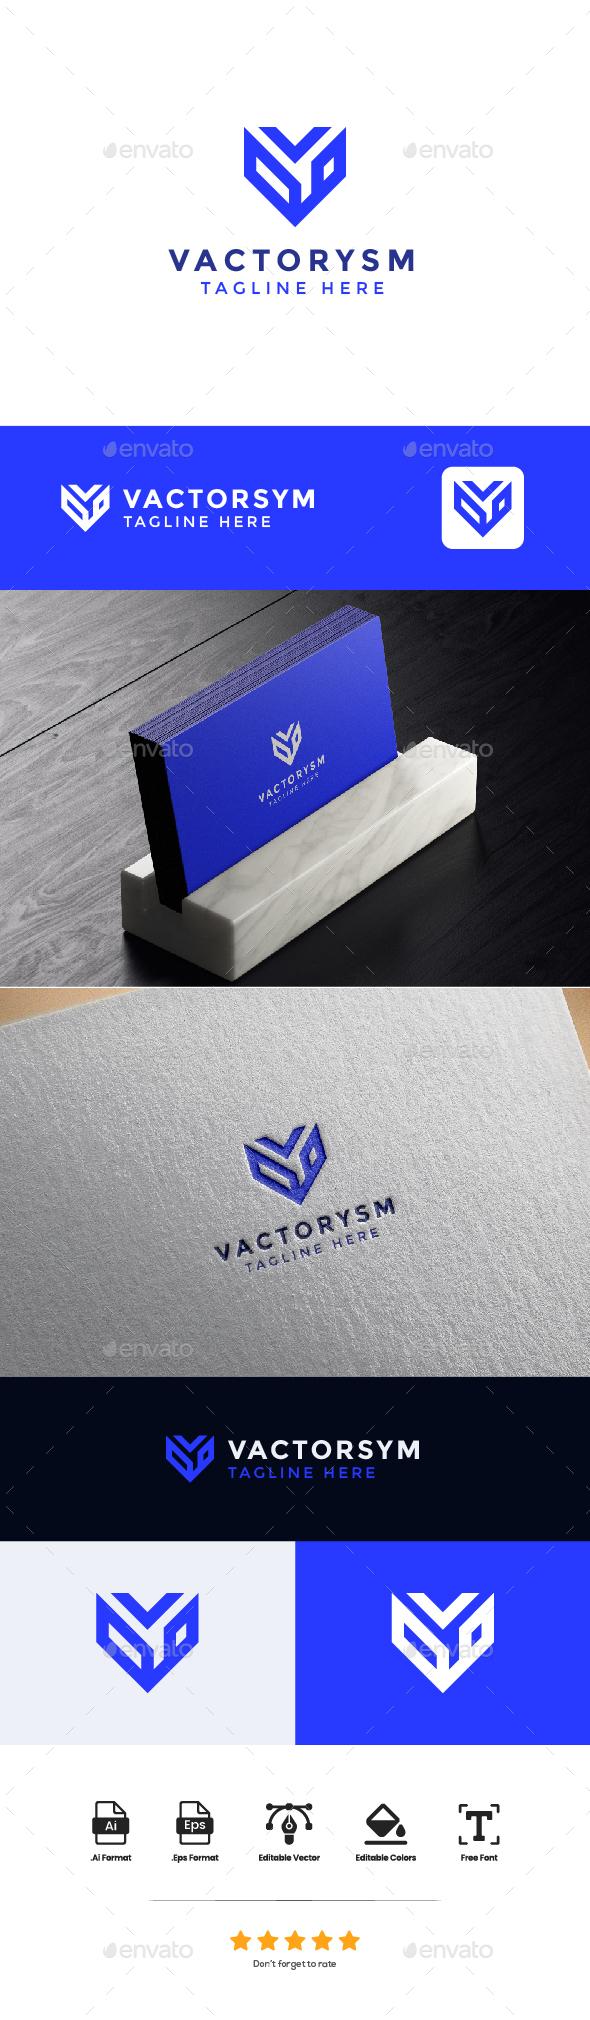 Logo Letter V - VACTORYSM